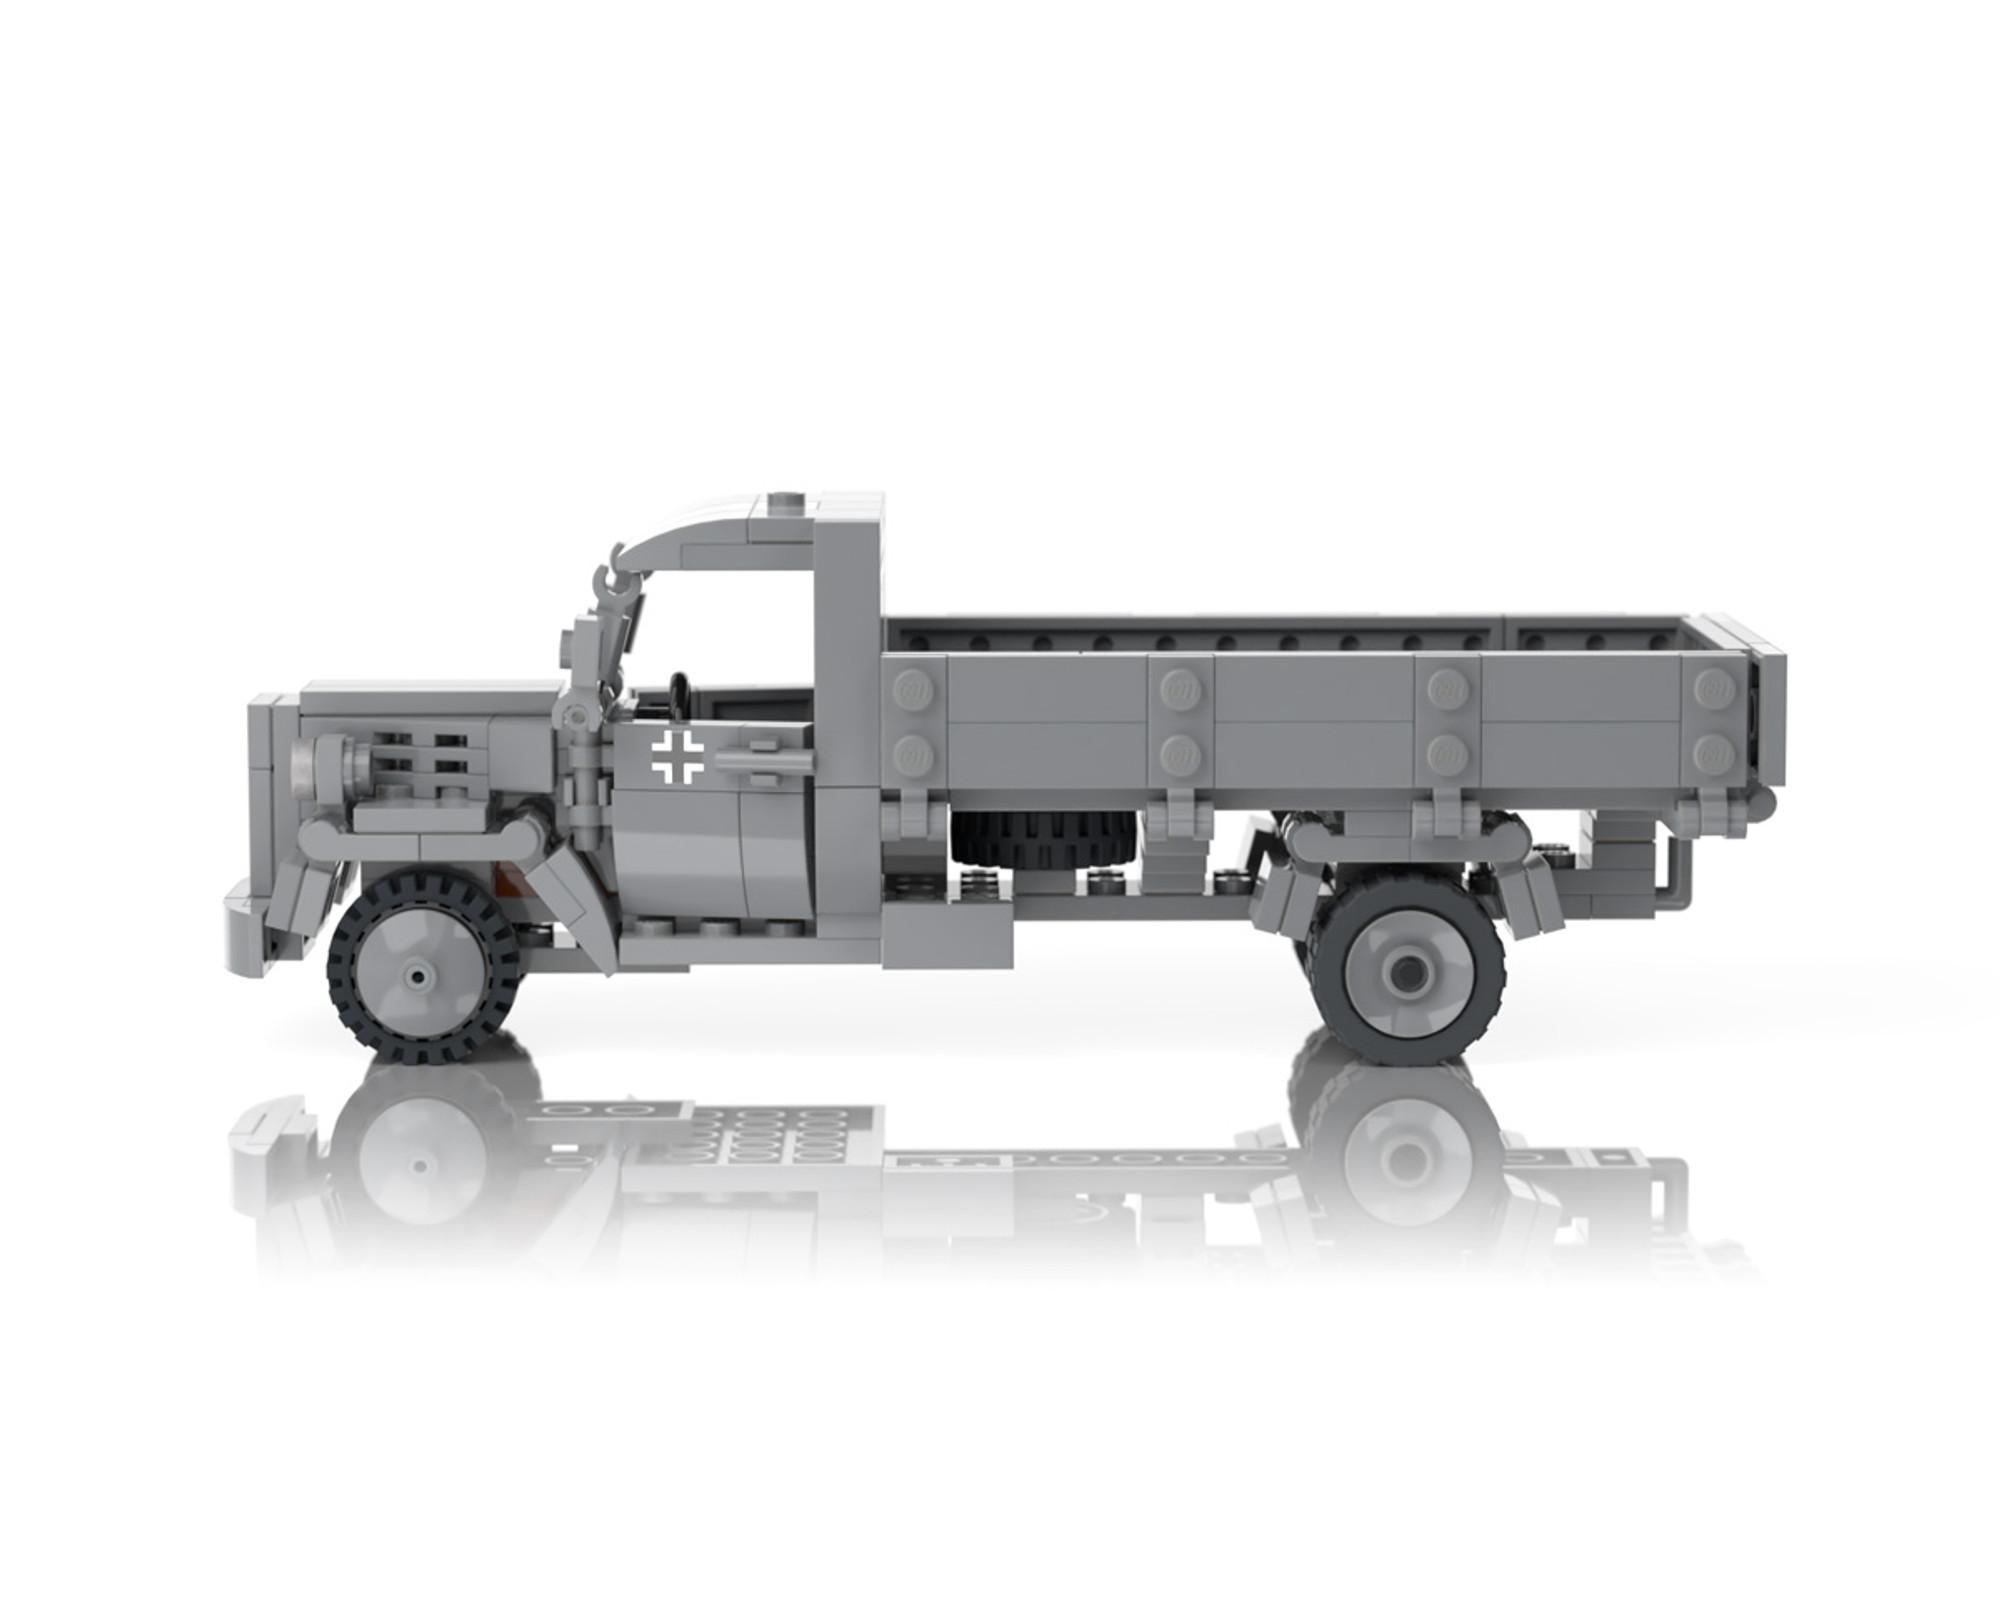 Opel Blitz Lightweight Truck Brickmania Toys